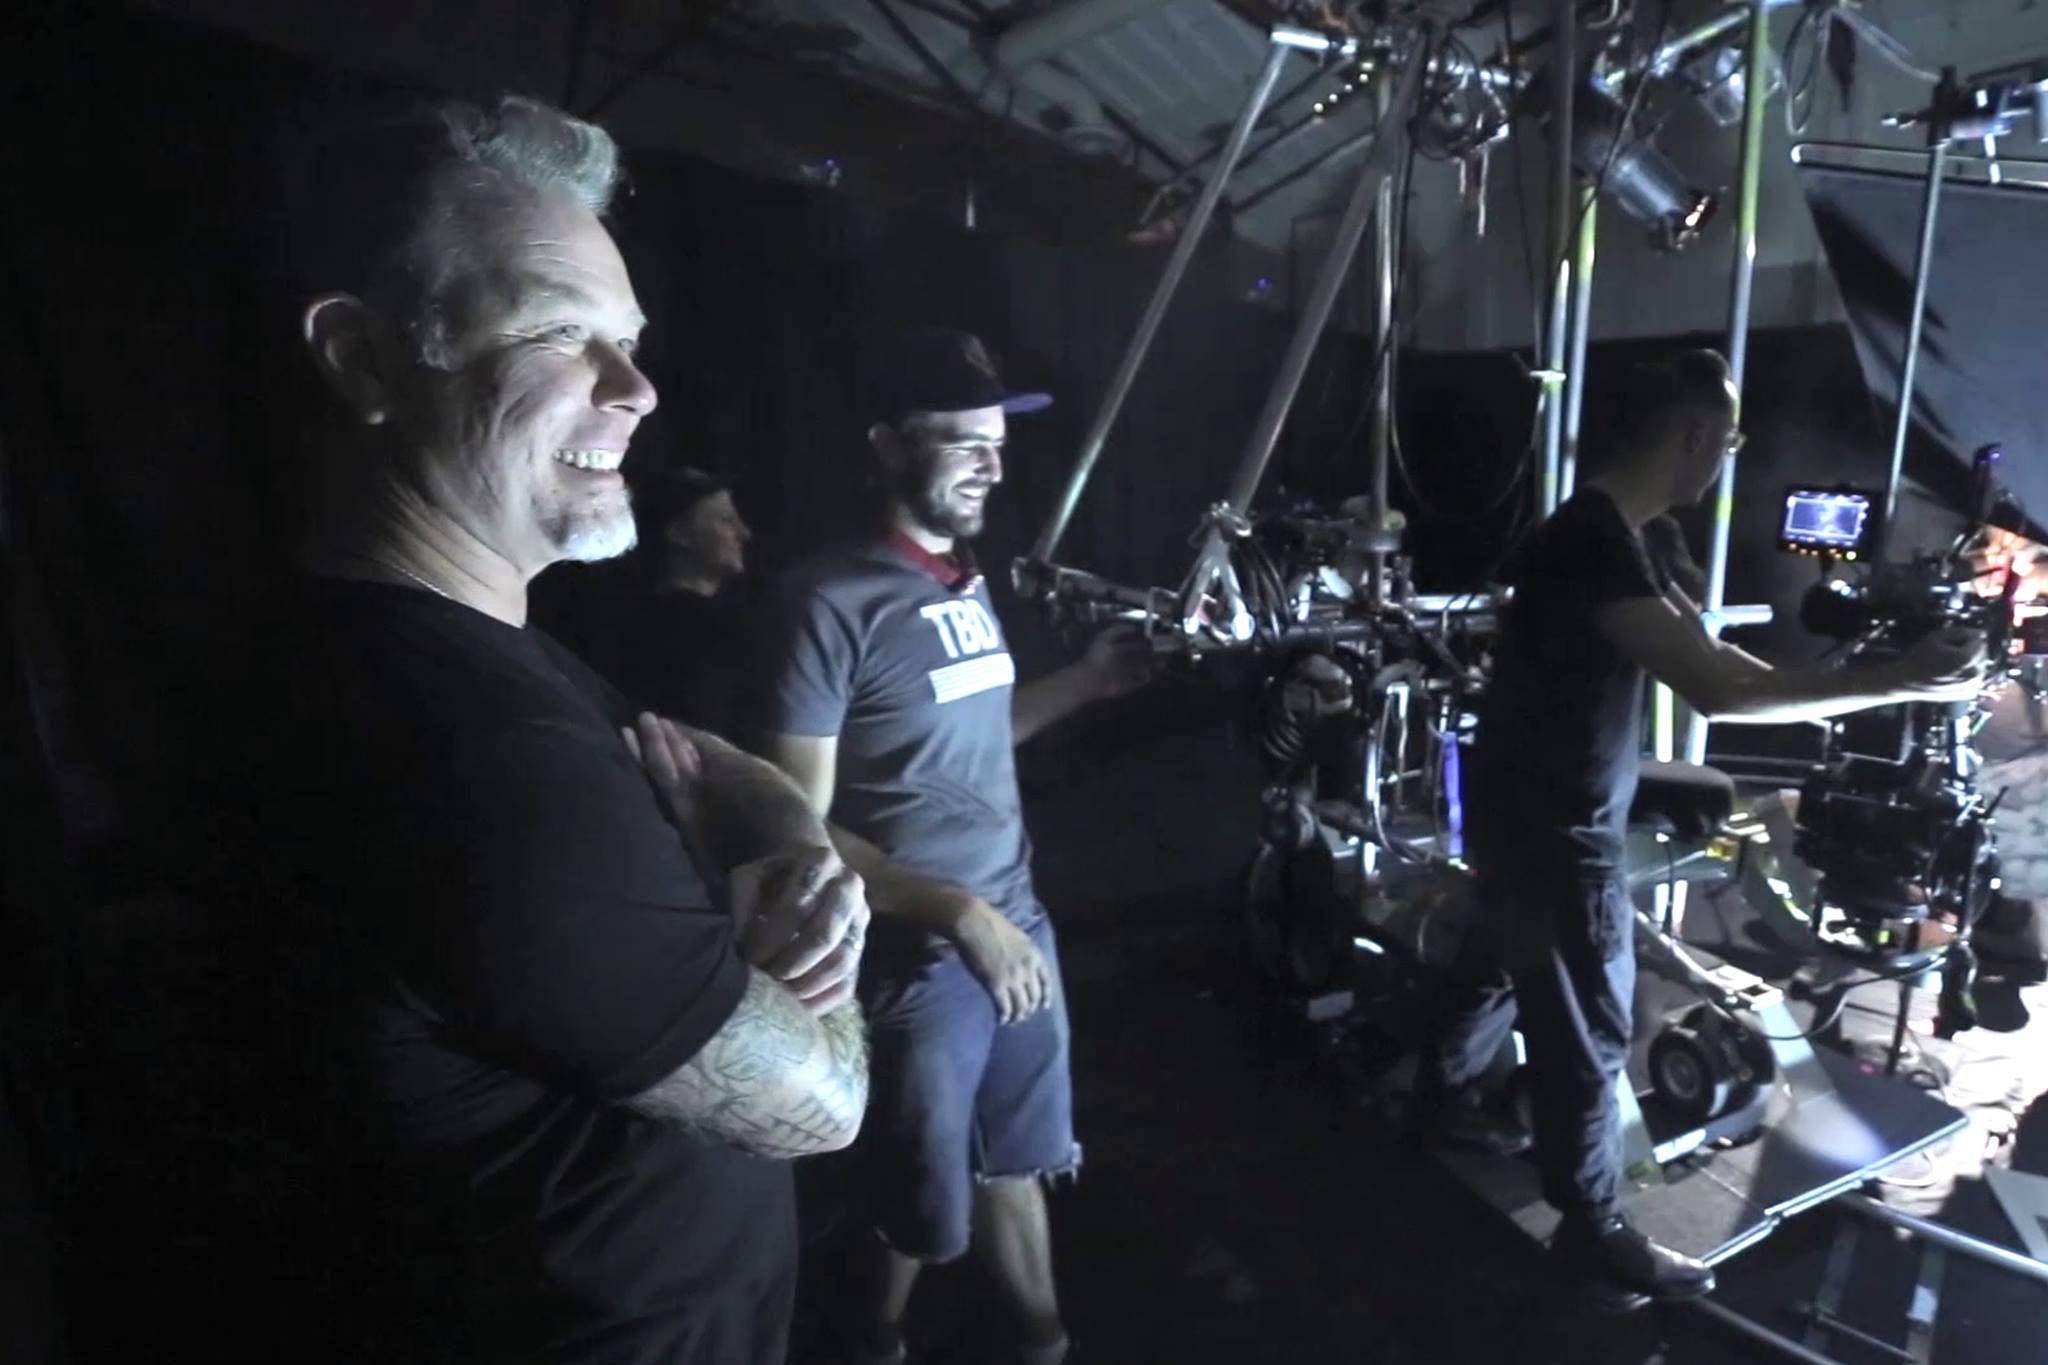 Metallica, Hardwired (Making Of Video)